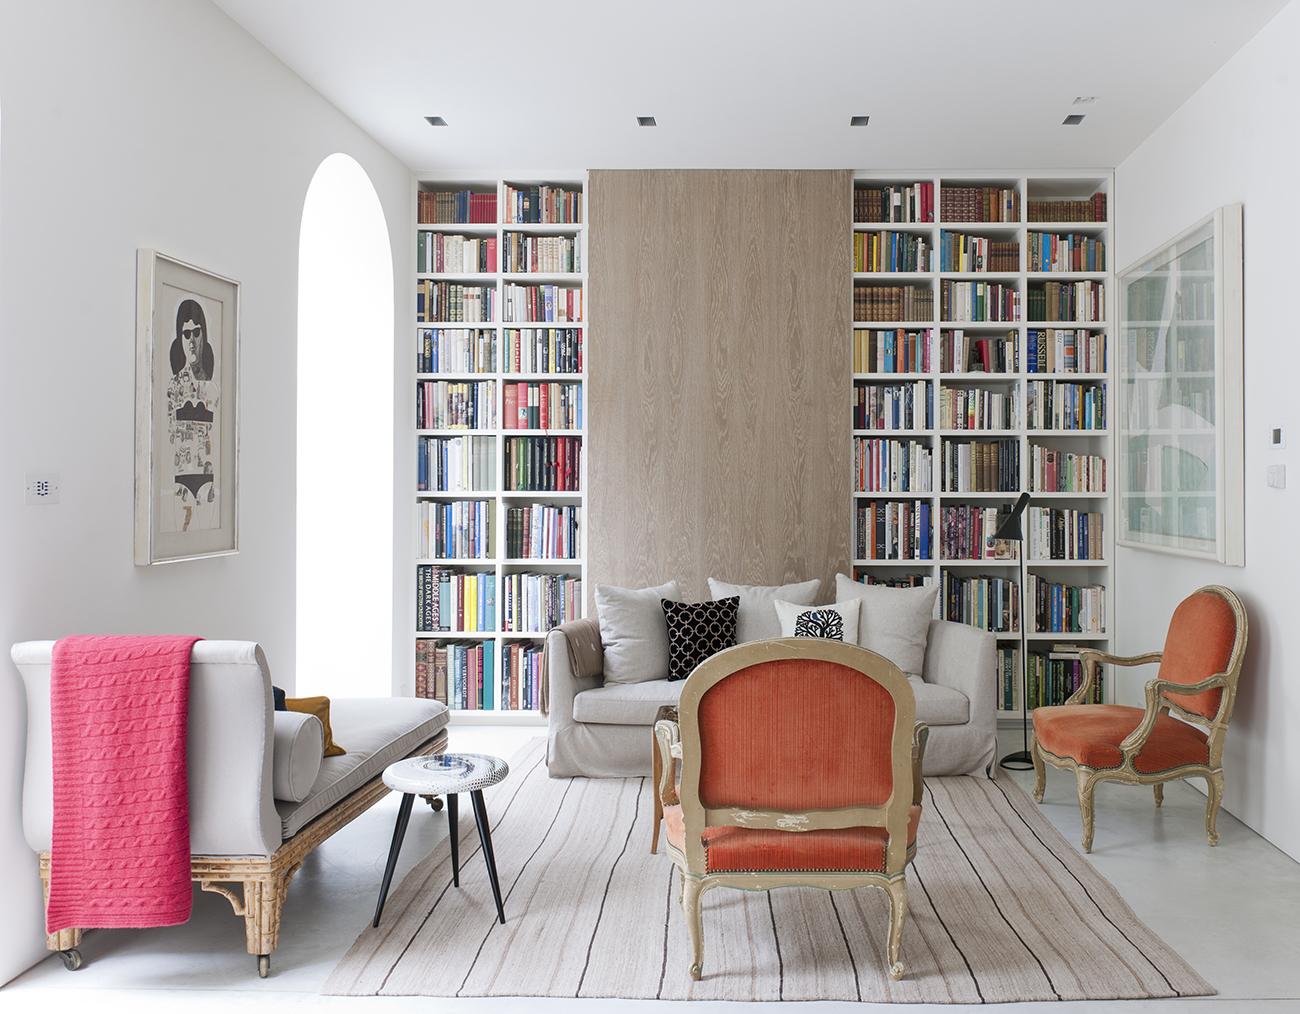 Mews-4-London-Hyde-Park-Andy-Martin-Architects-LG5.jpg